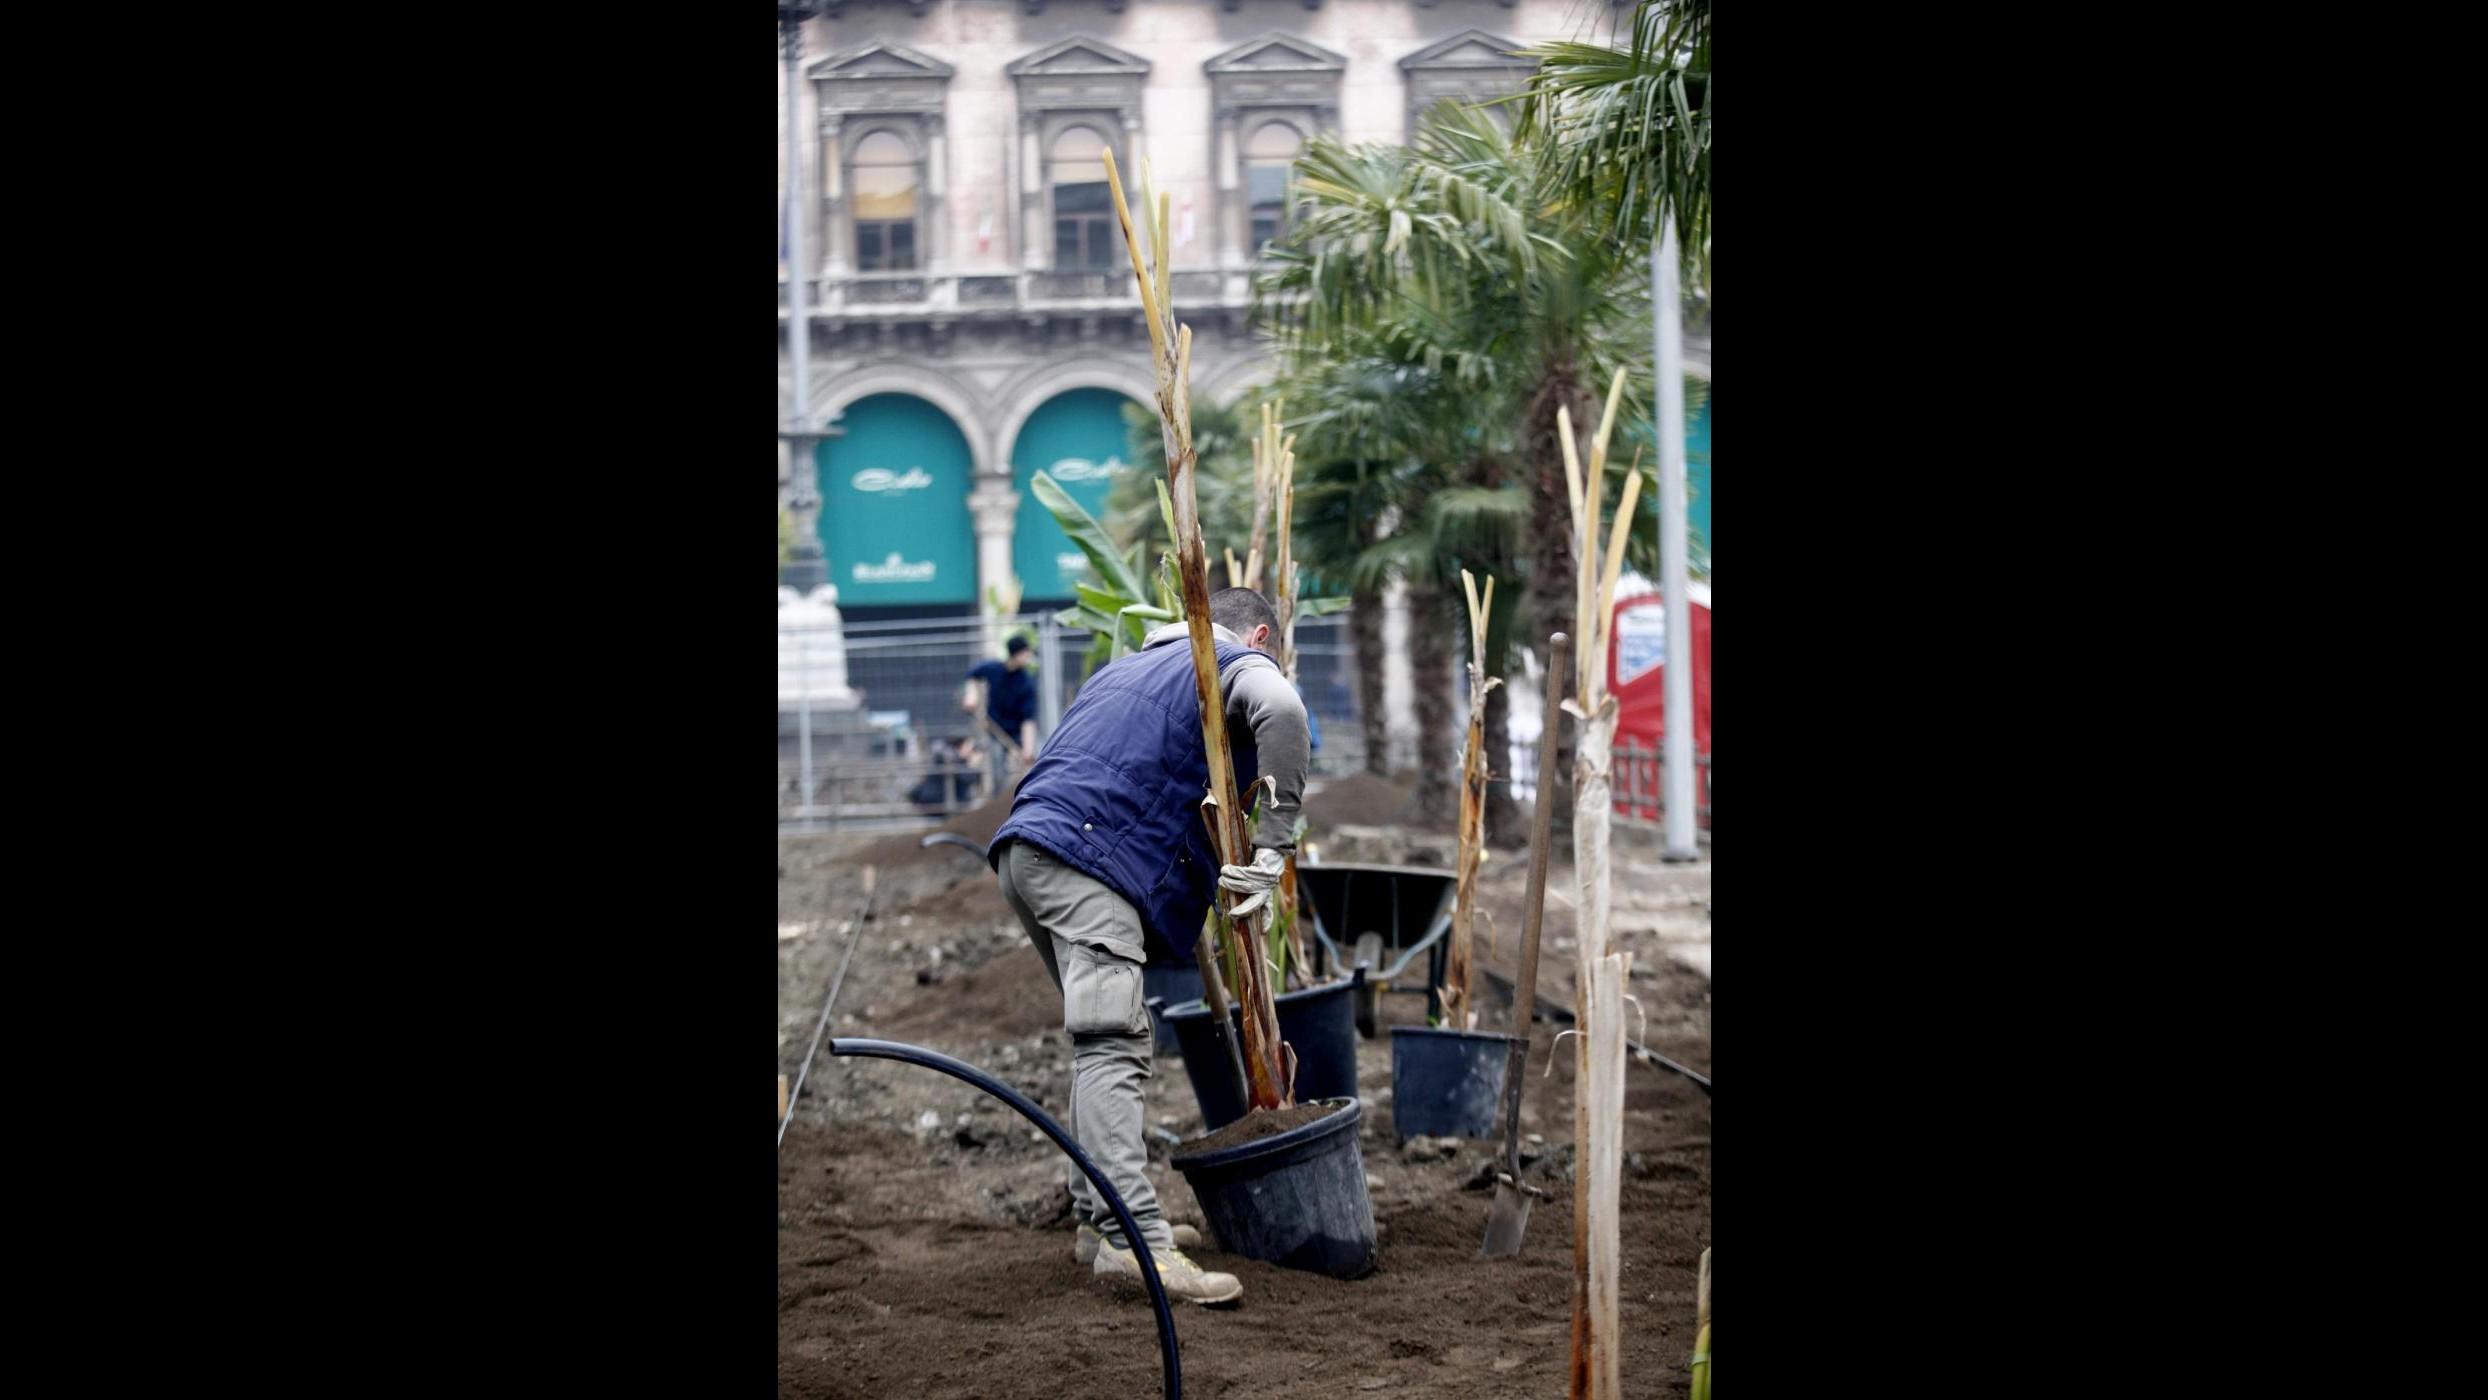 In piazza Duomo dopo le palme spuntano i banani